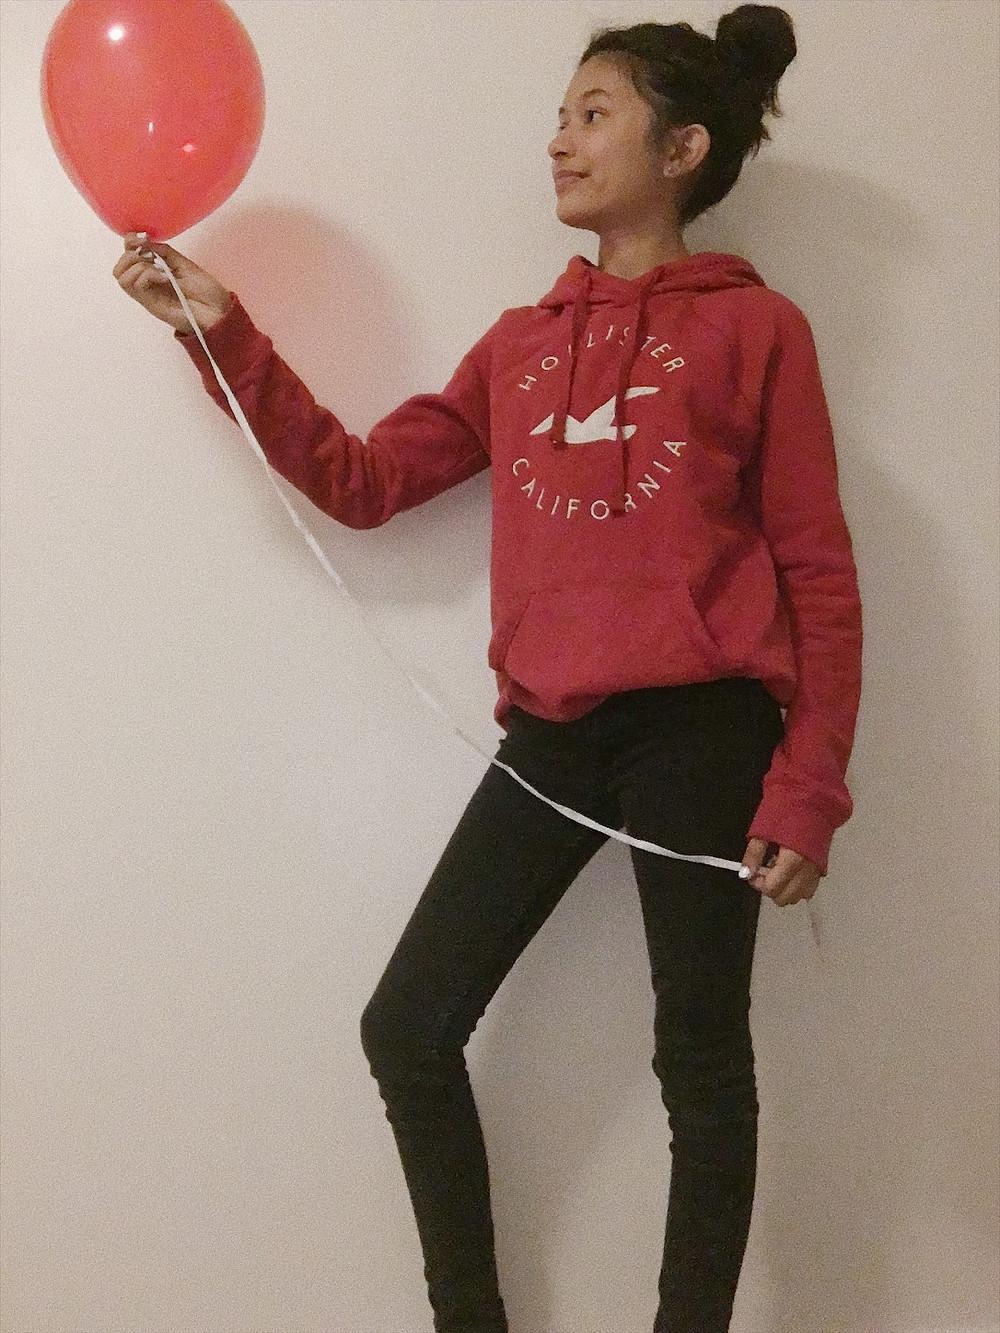 Daniela Red Balloon